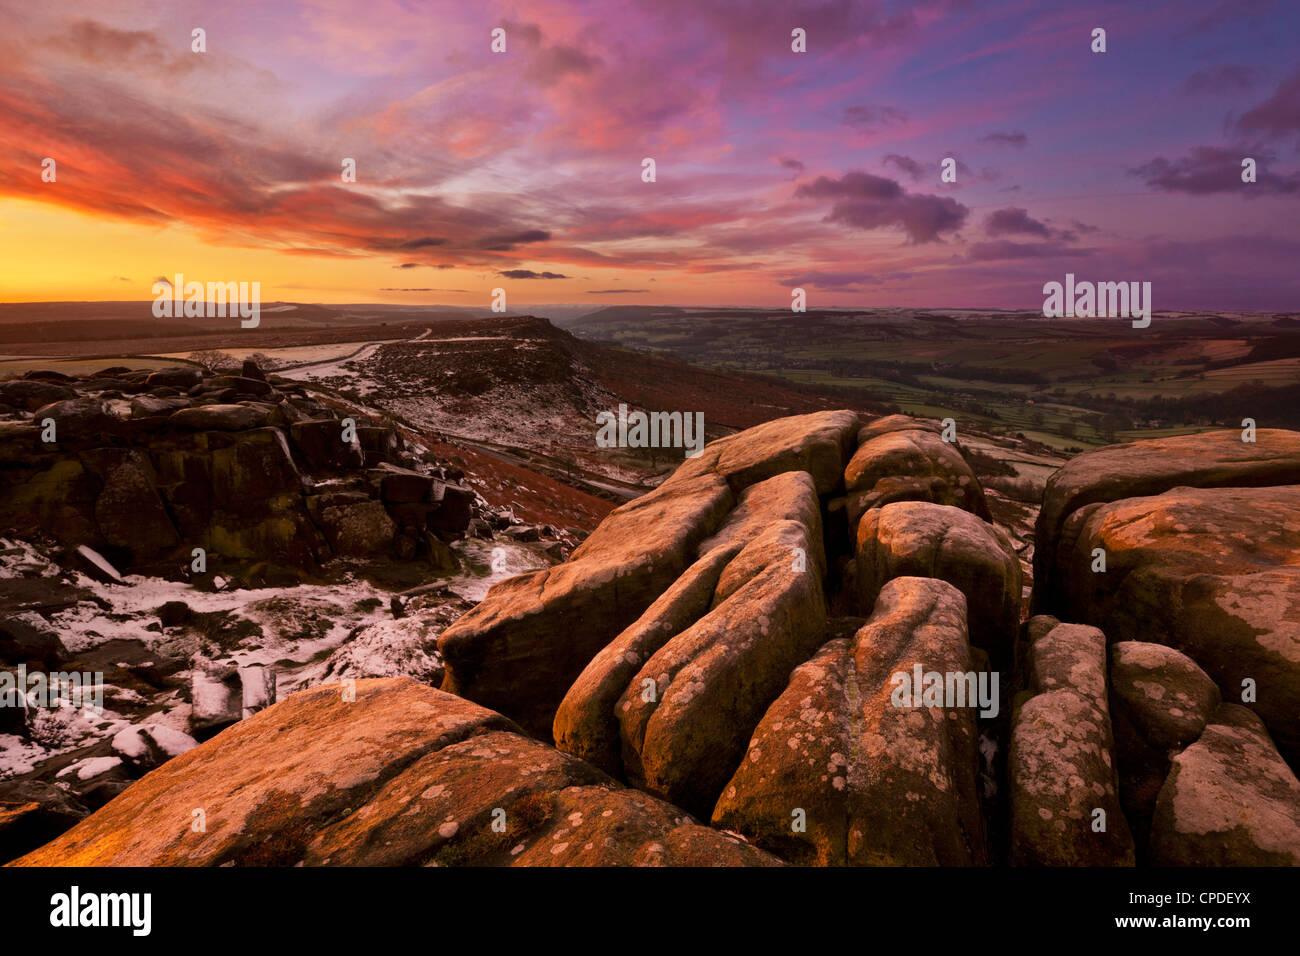 Frosty winter sunrise, Froggatt and Curbar Edge, Peak District National Park, Derbyshire, England, United Kingdom, - Stock Image